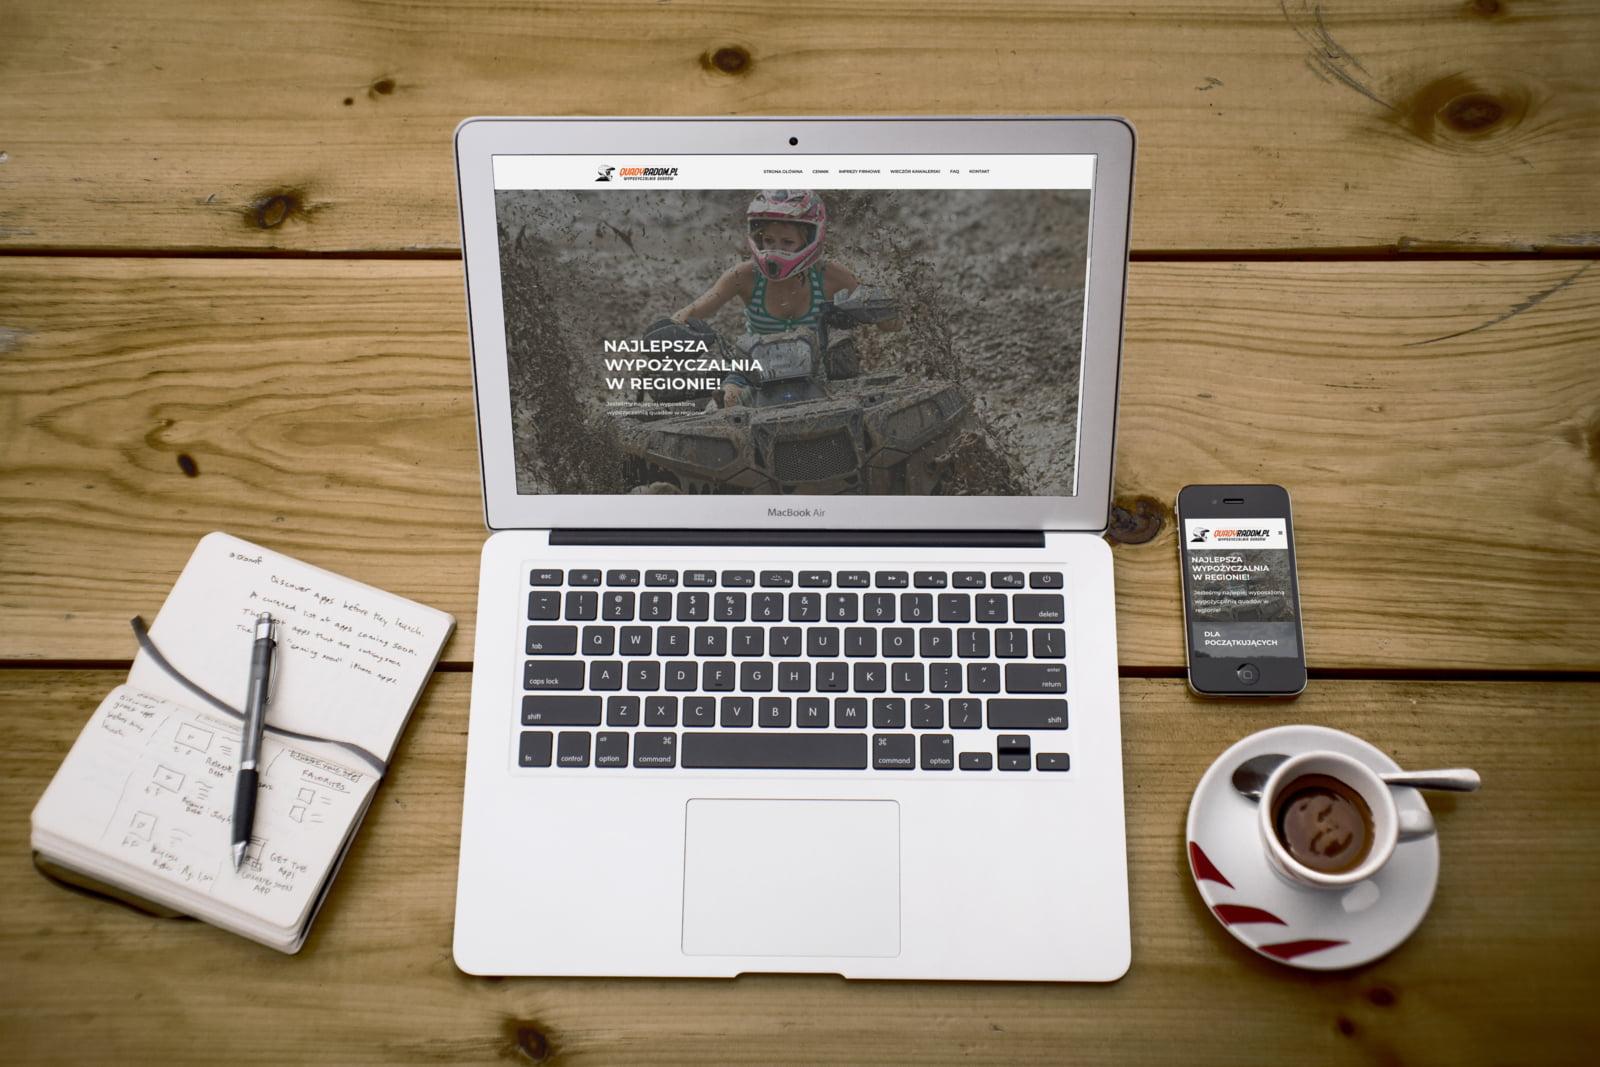 ATV/SSV rental website